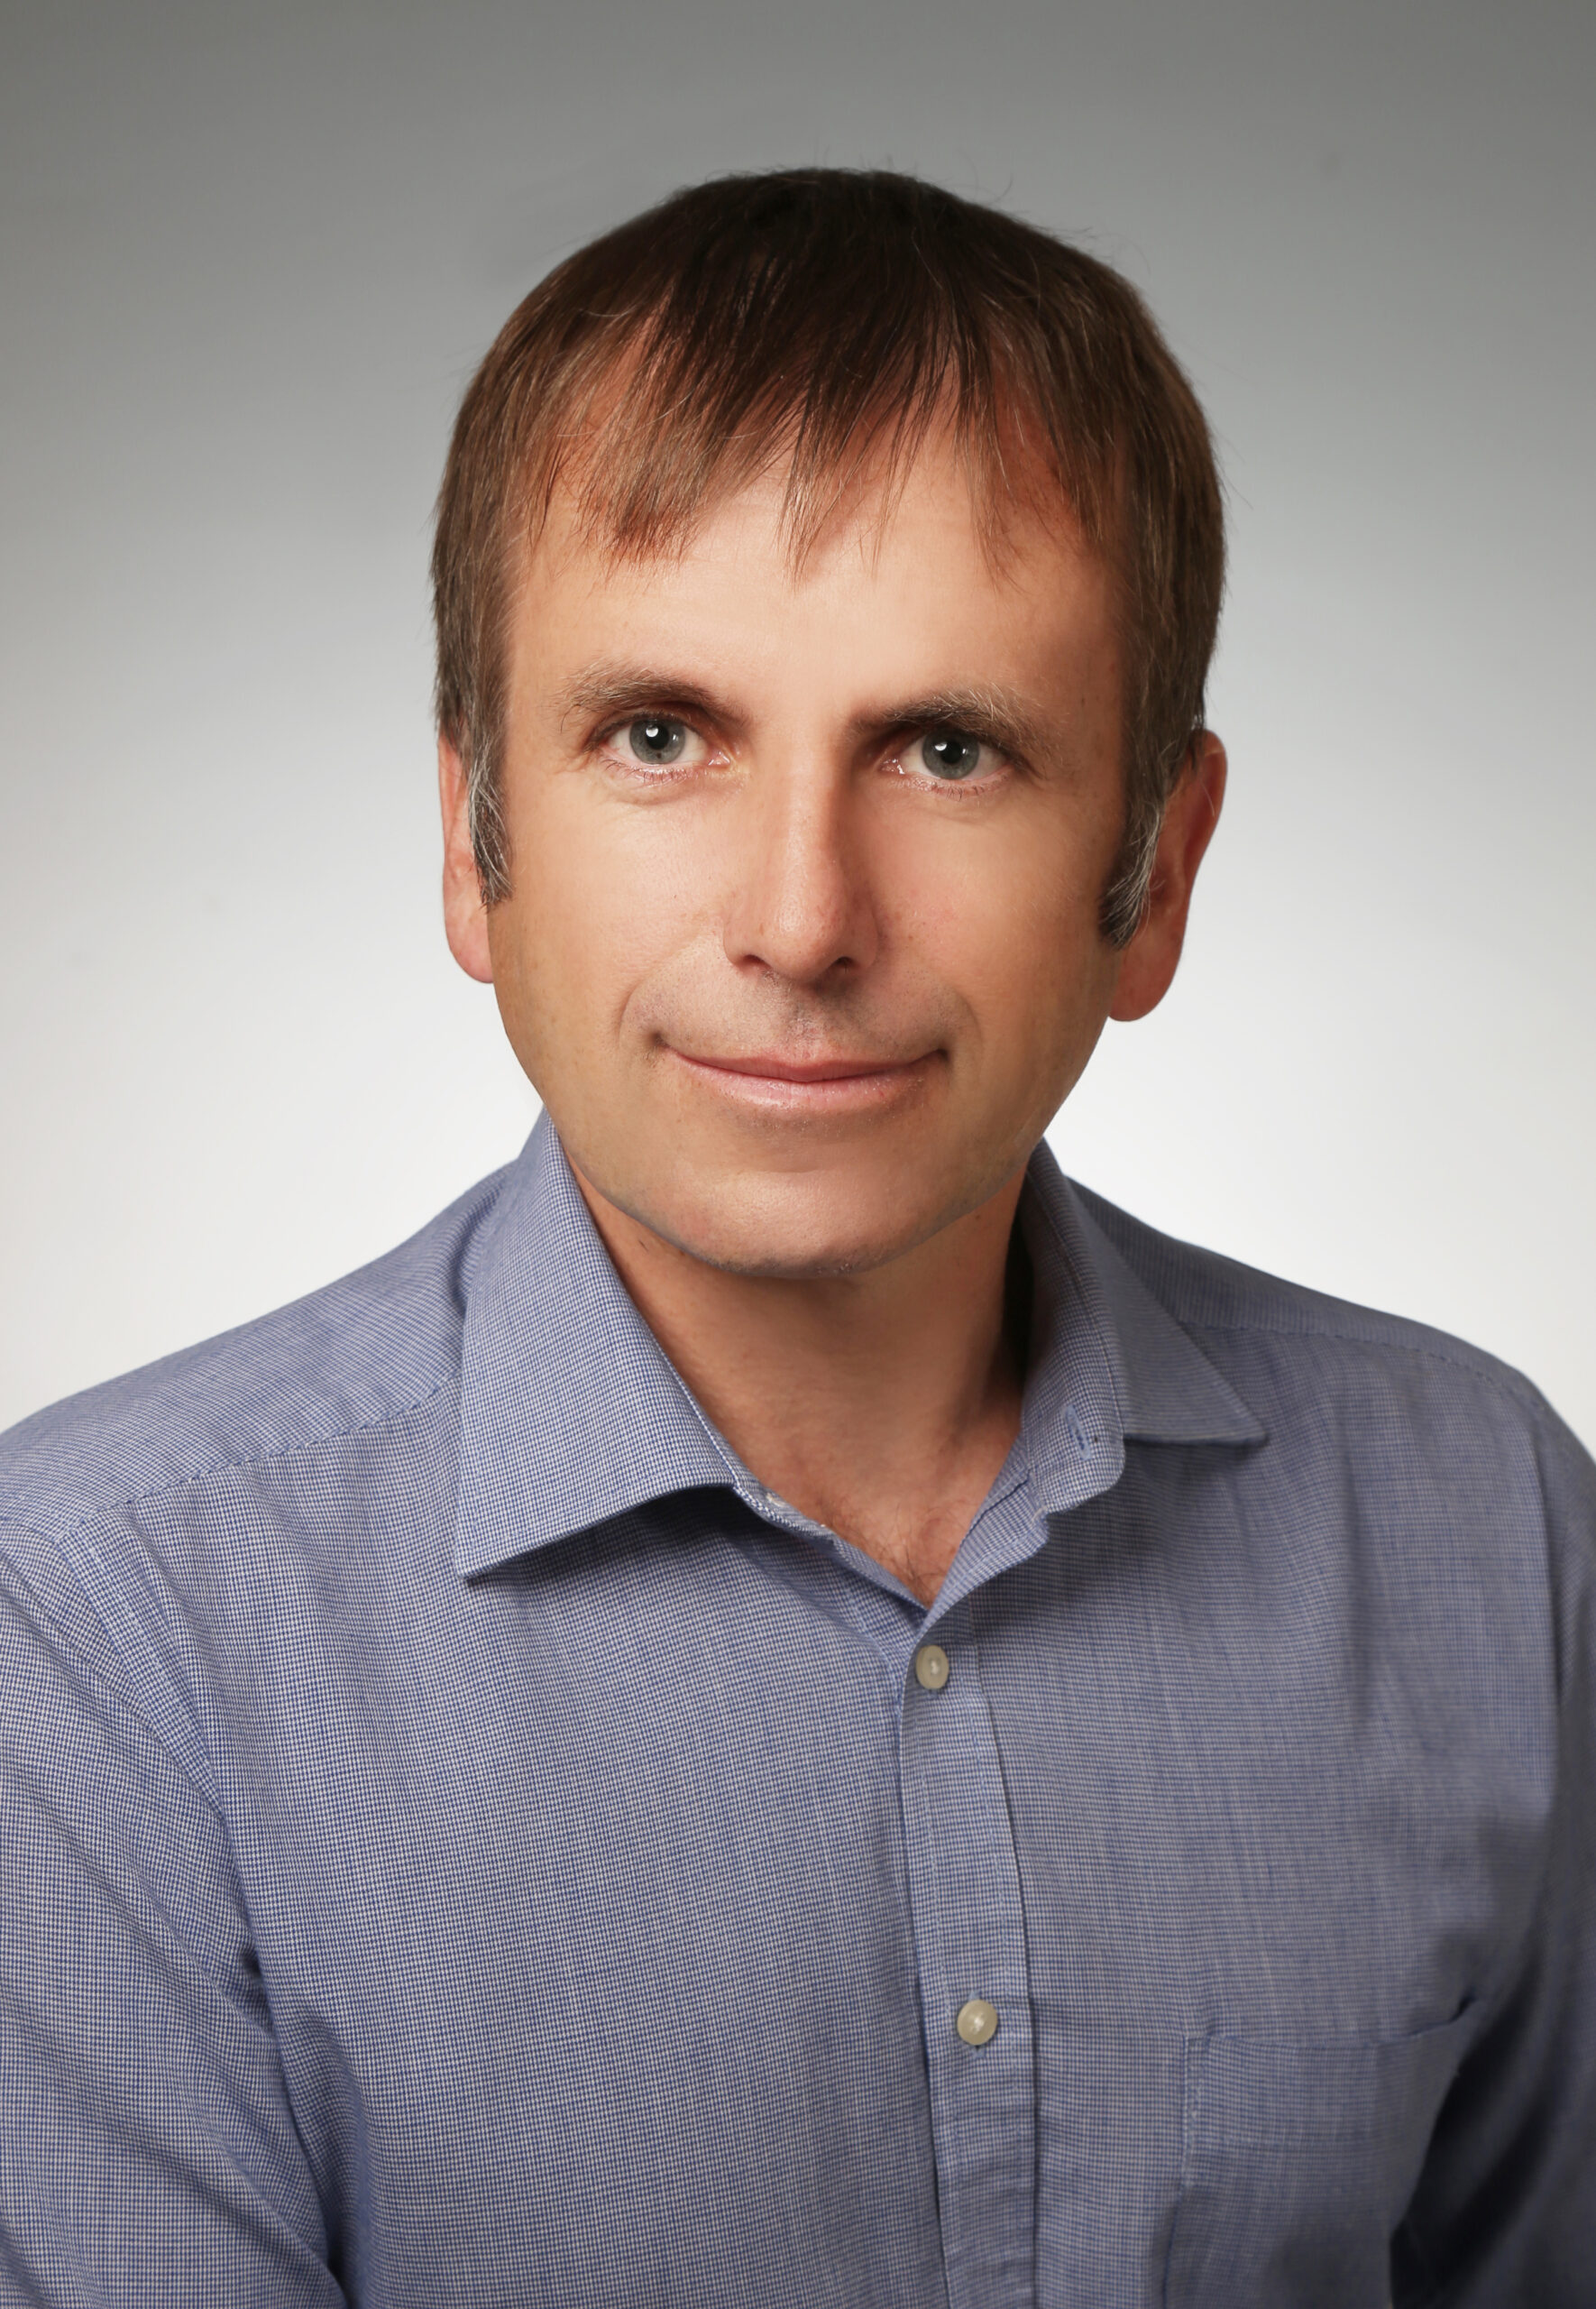 Marcin Żurowski